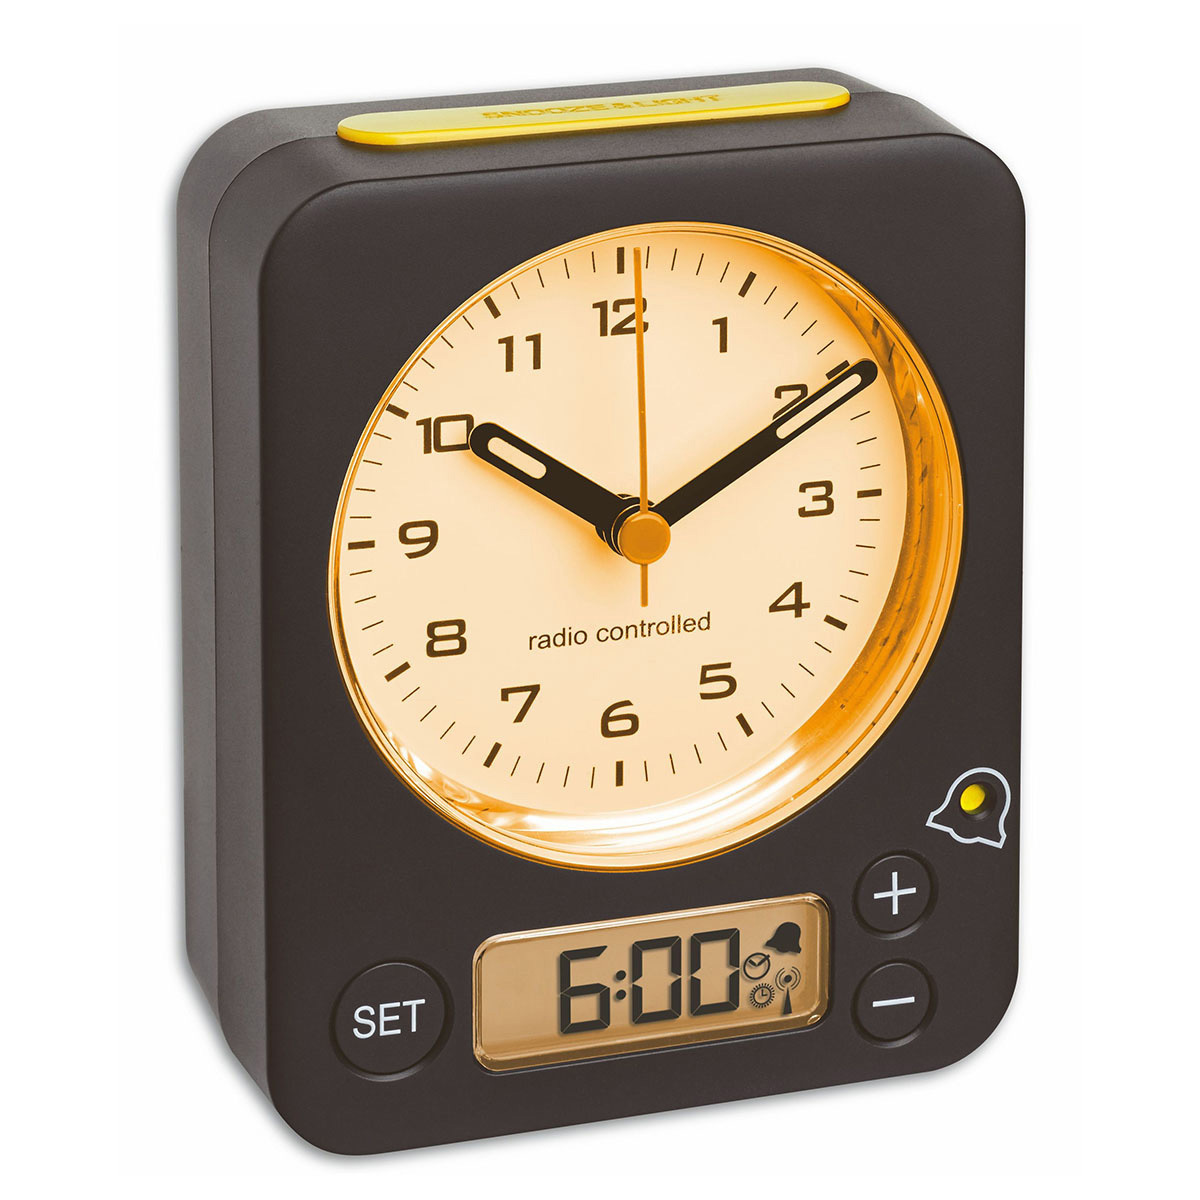 60-1511-01-07-analoger-funk-wecker-combo-beleuchtung-1200x1200px.jpg